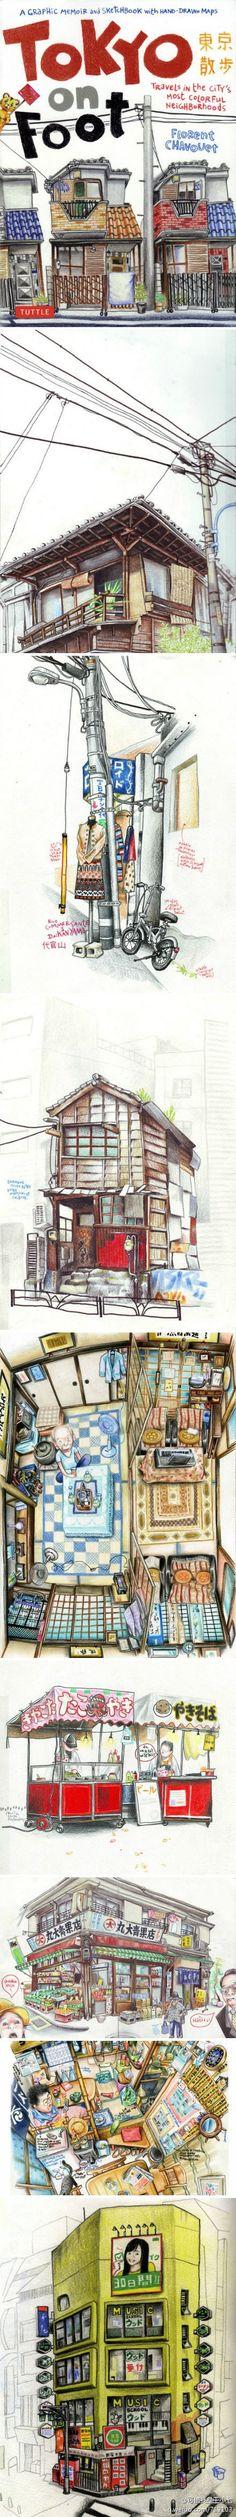 Tokyo on Foot <3